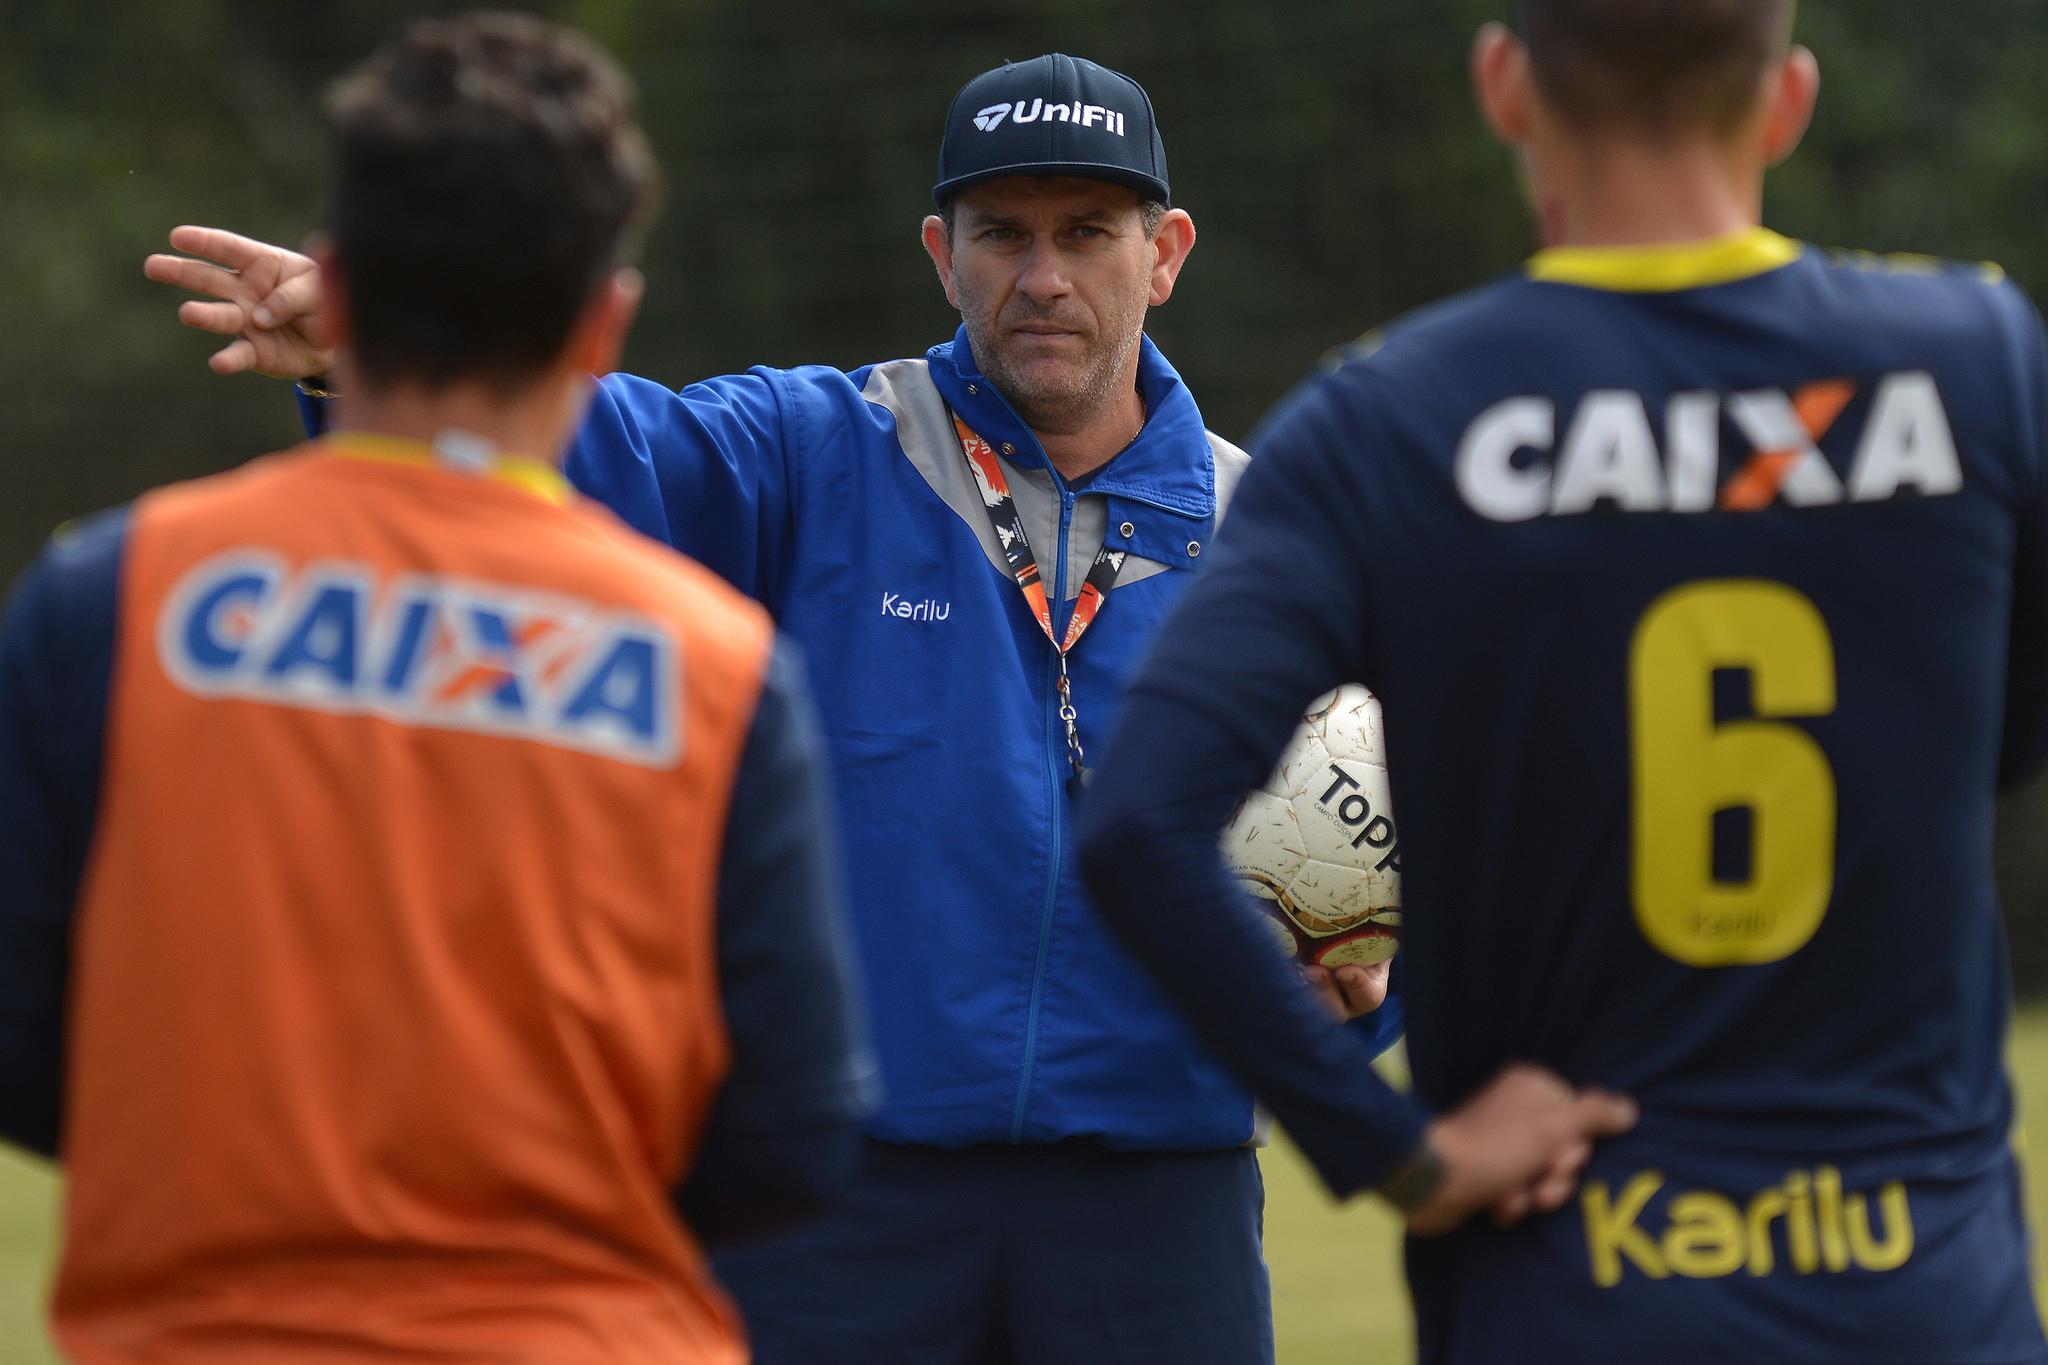 Londrina - Claudio Tencati - Foto Gustavo Oliveira Londrina Esporte Clube